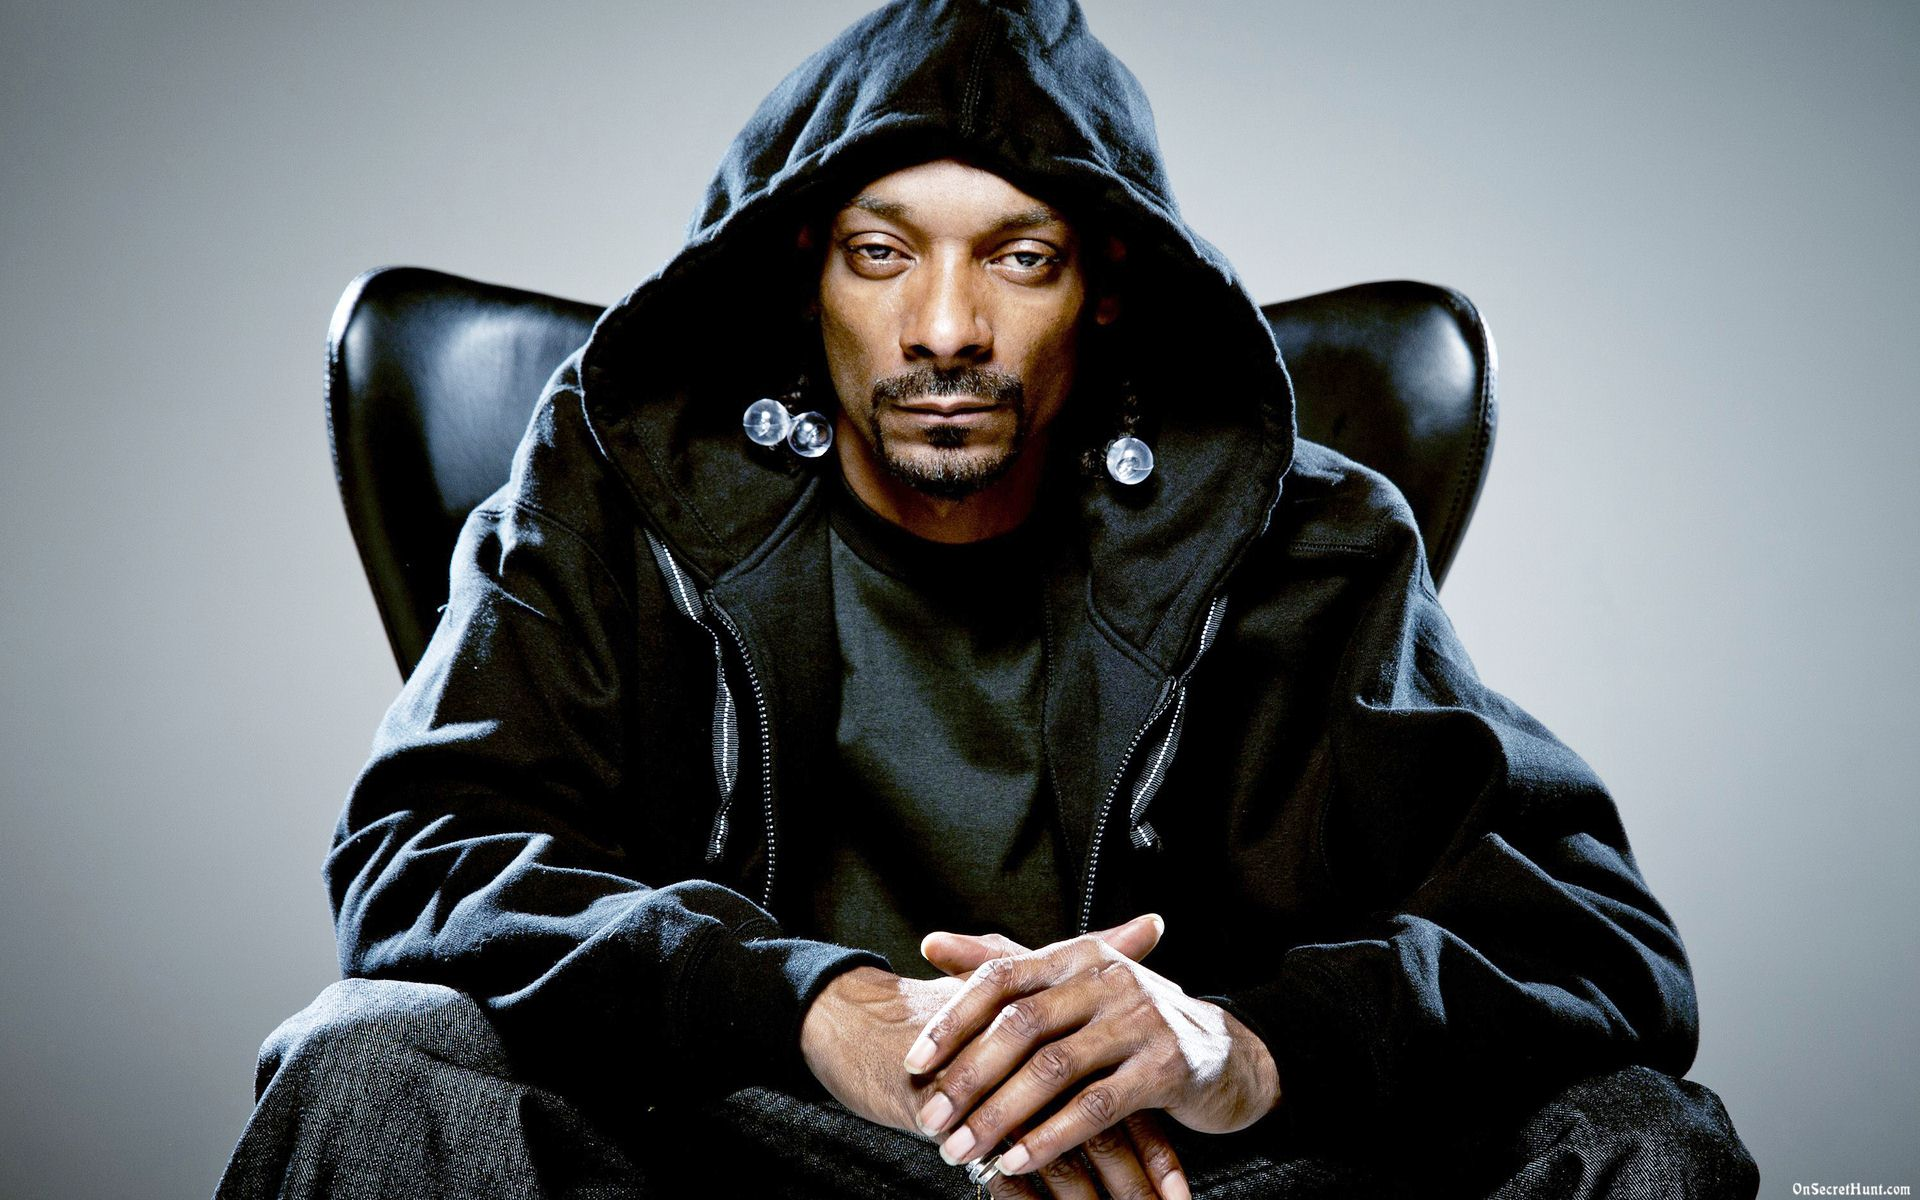 Interpellé par la police en Suède, Snoop Dogg décide  de ne plus y remettre les pieds